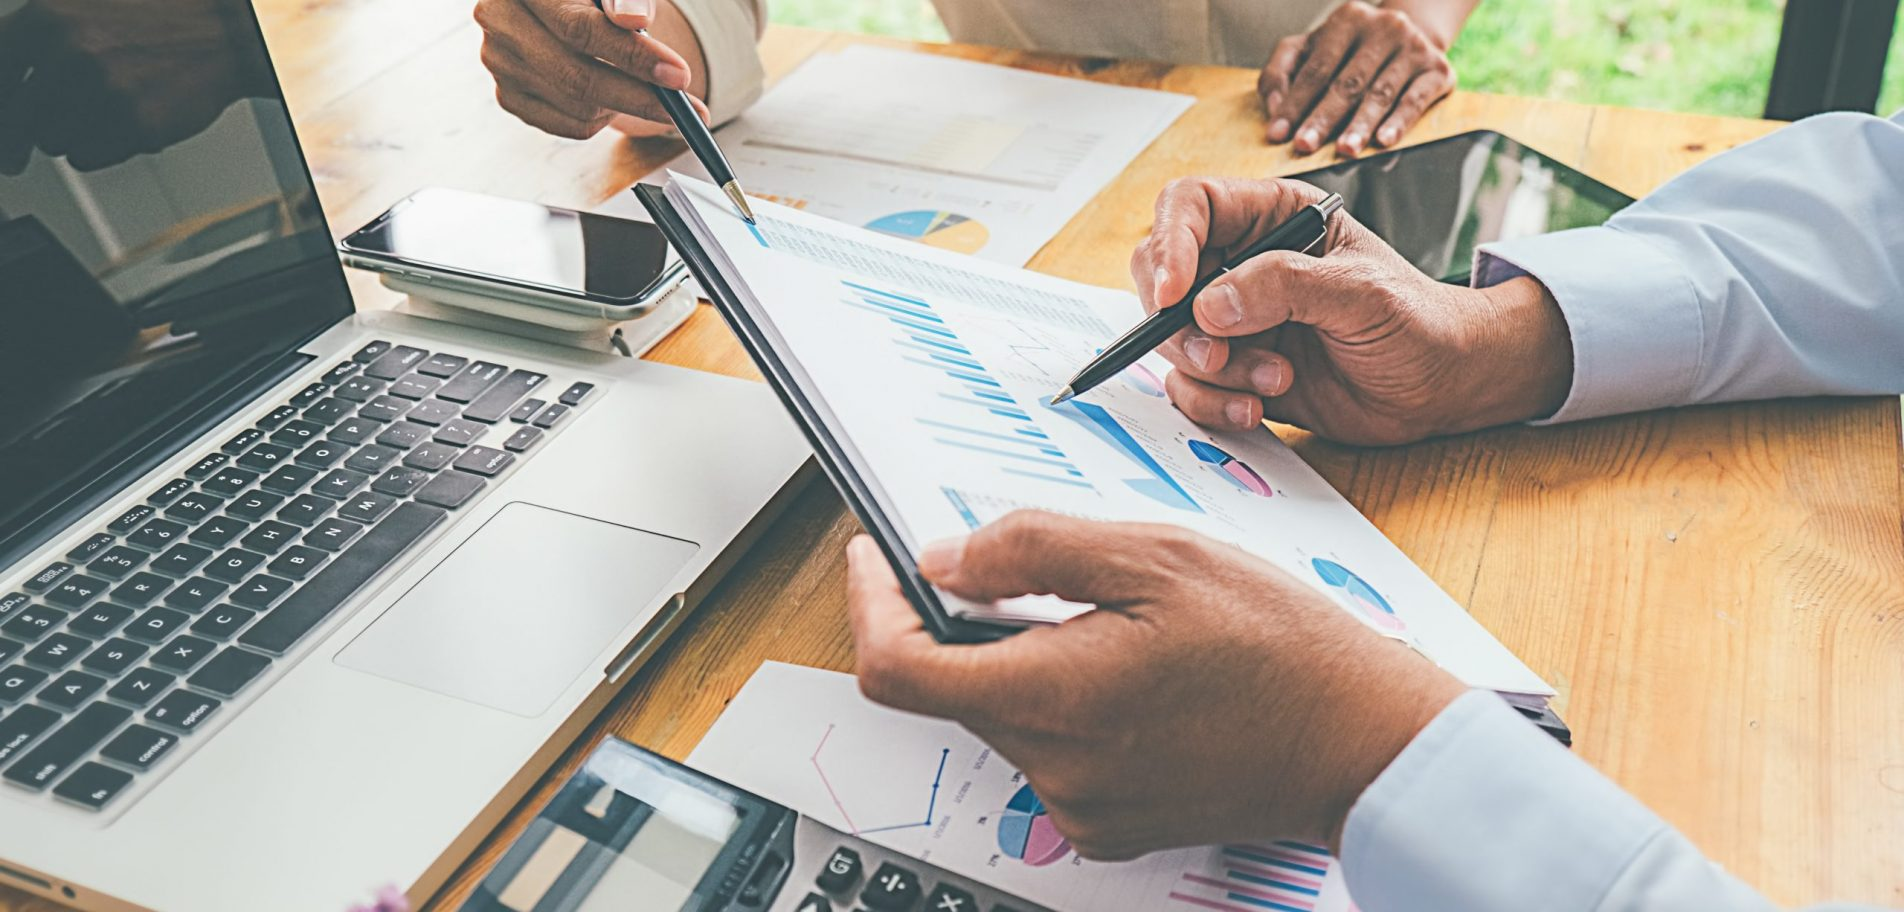 équipe analyse comptes entreprise coopérative